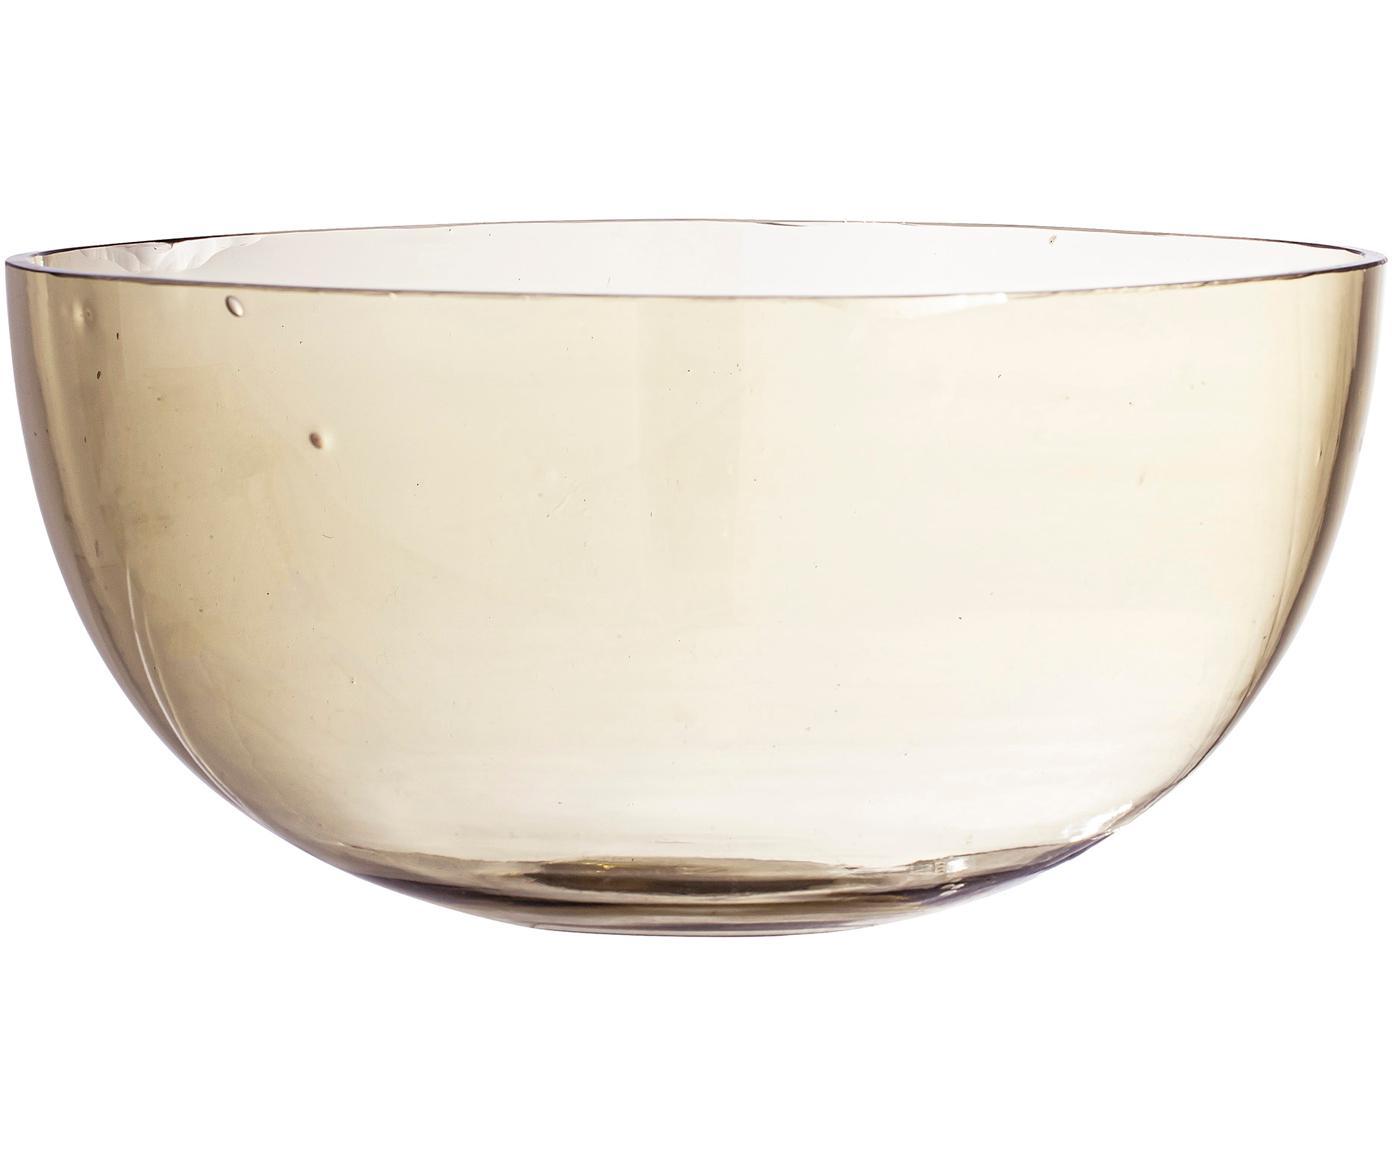 Schüssel Casie aus recyceltem Glas, Recyceltes Glas, Braun, transparent, Ø 22 x H 11 cm